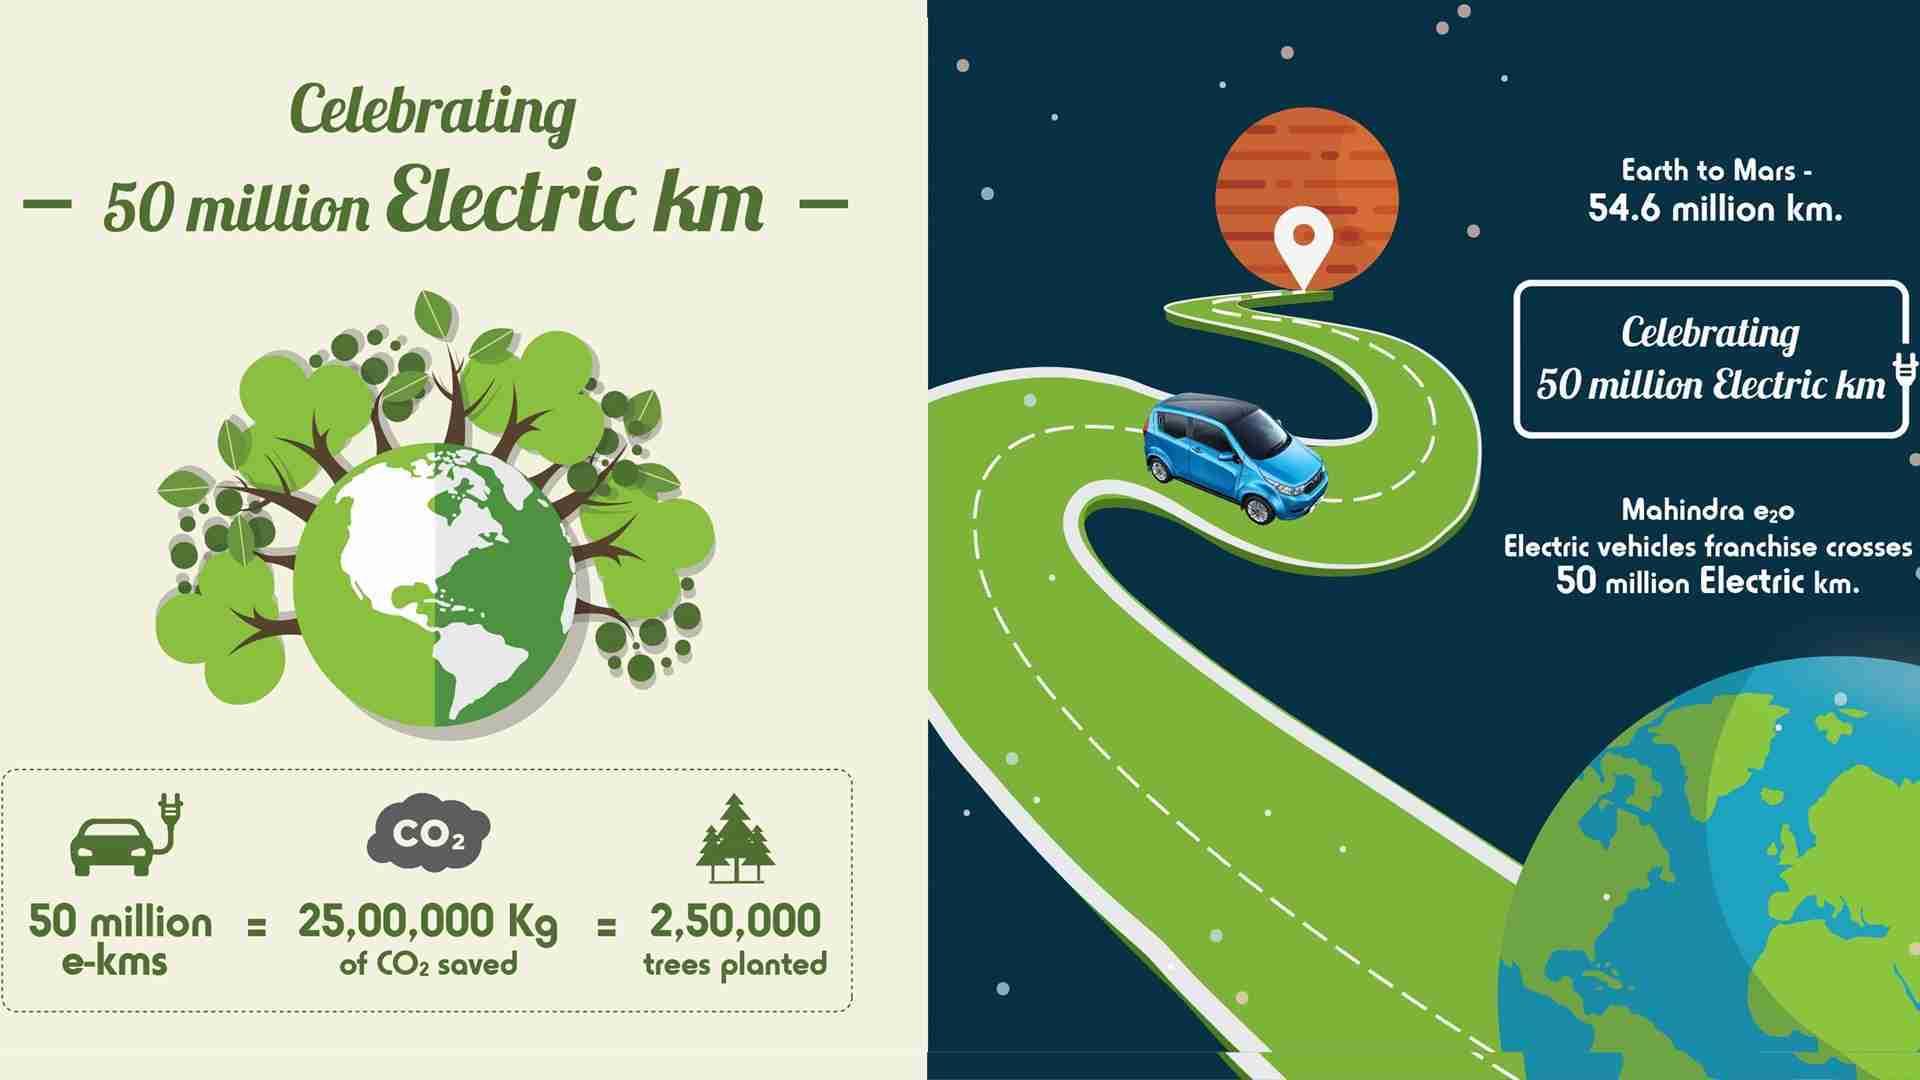 Mahindra Electric Crosses 50 Million green Kilometres